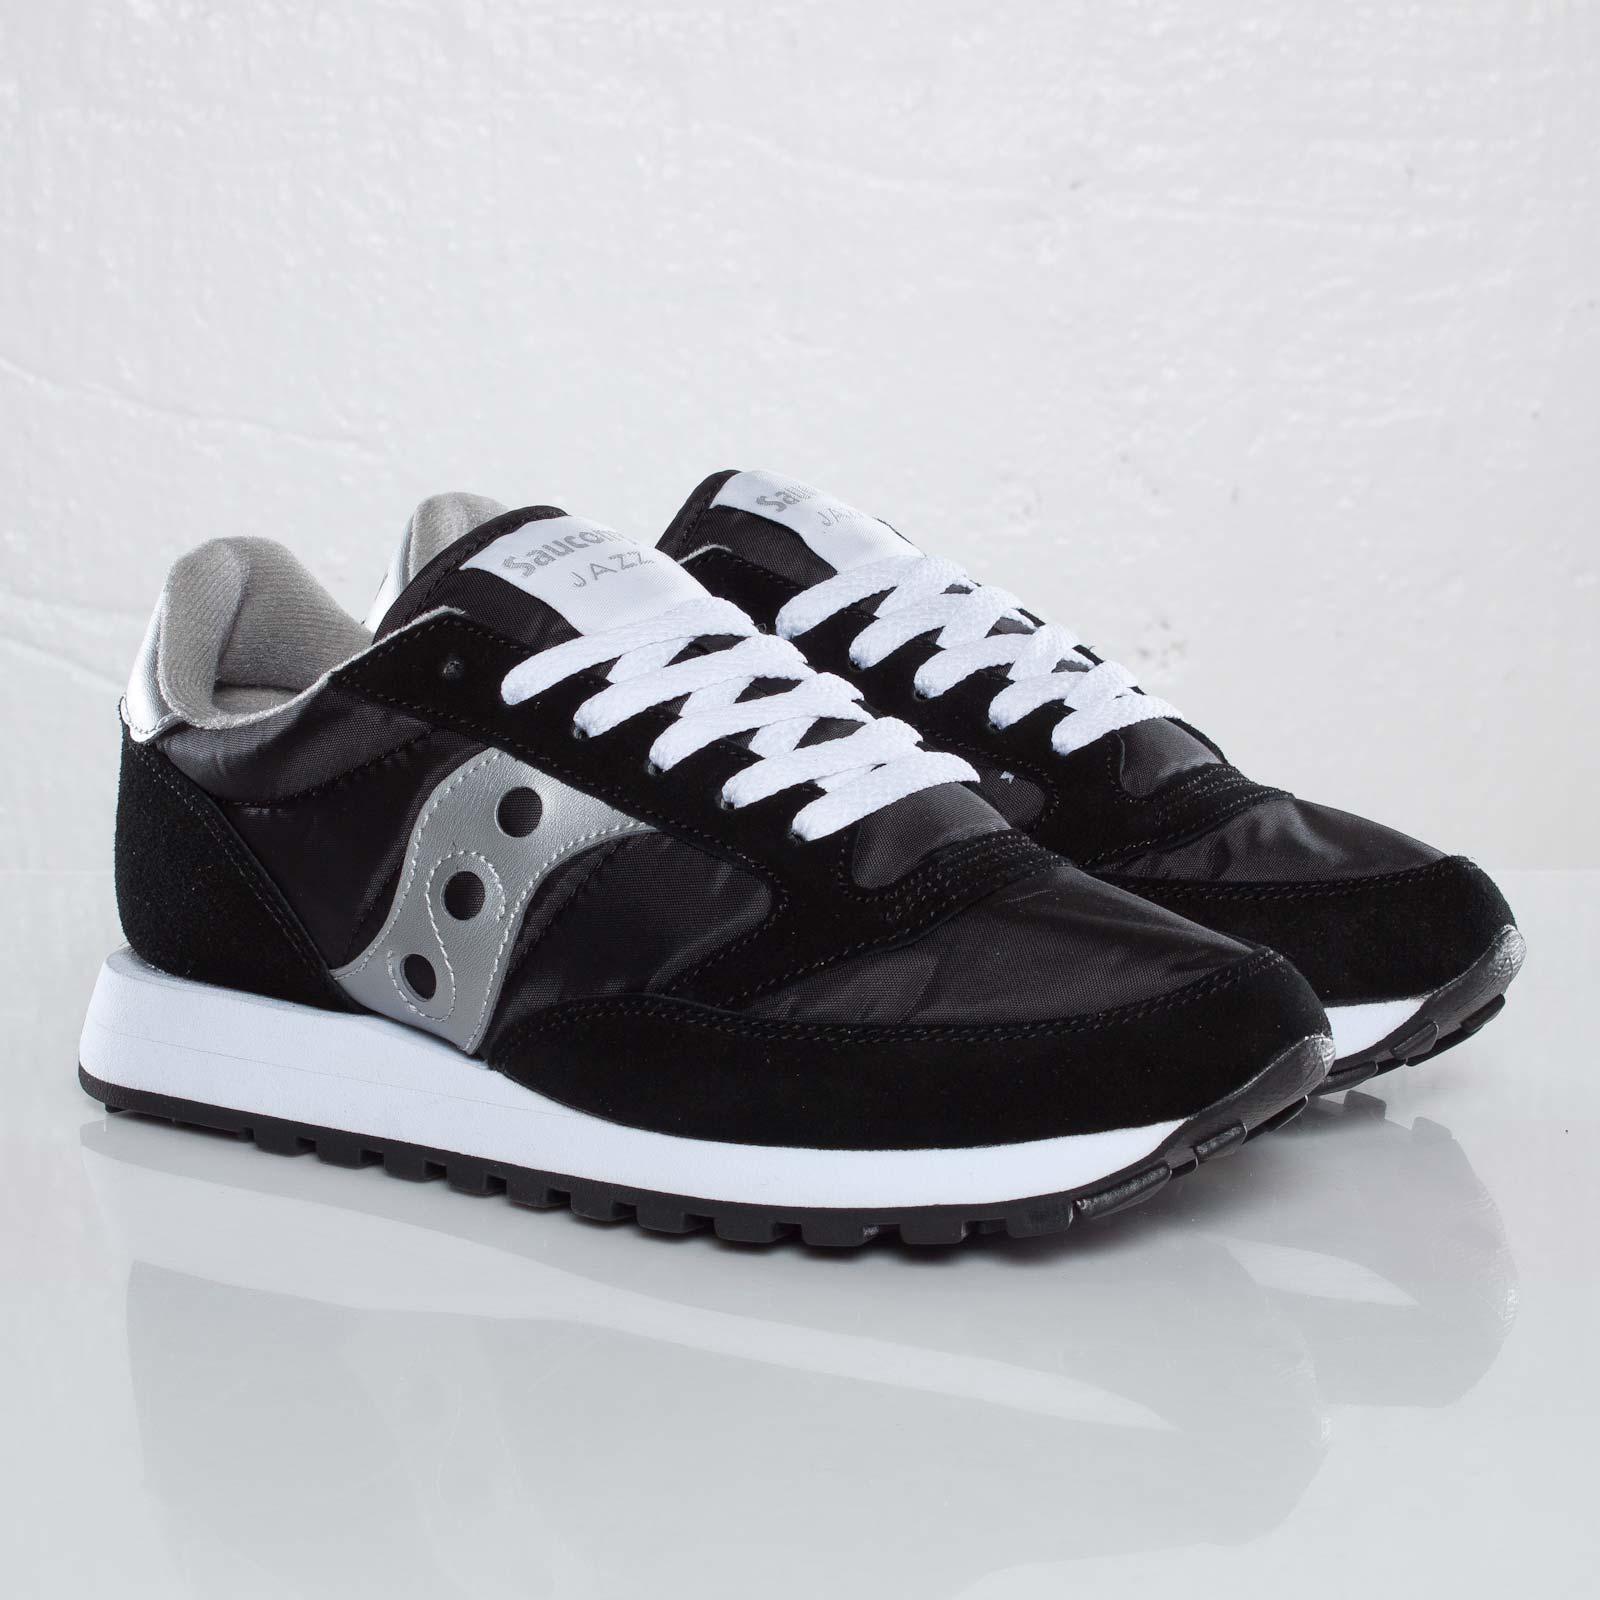 promo code 3ff0b c9a5e Saucony Jazz Original - 2044-1 - Sneakersnstuff   sneakers ...